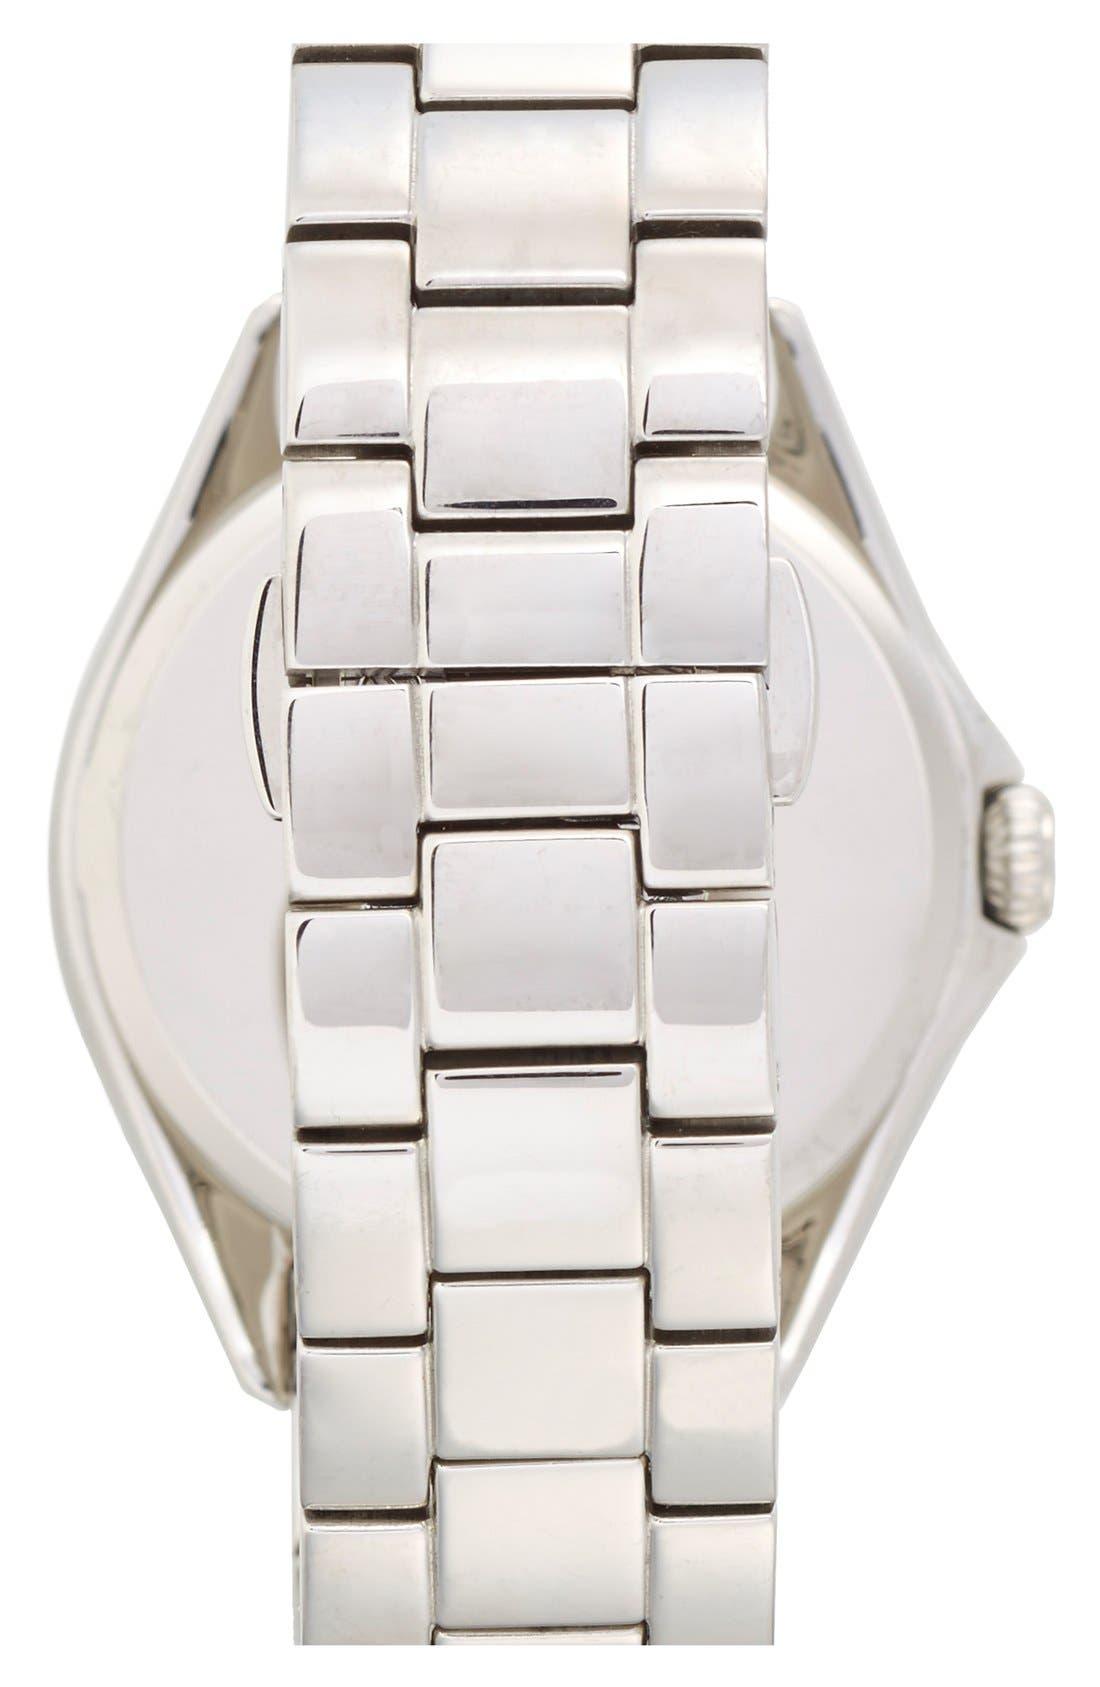 KATE SPADE NEW YORK, 'seaport grand' bracelet watch, 38mm, Alternate thumbnail 3, color, 040